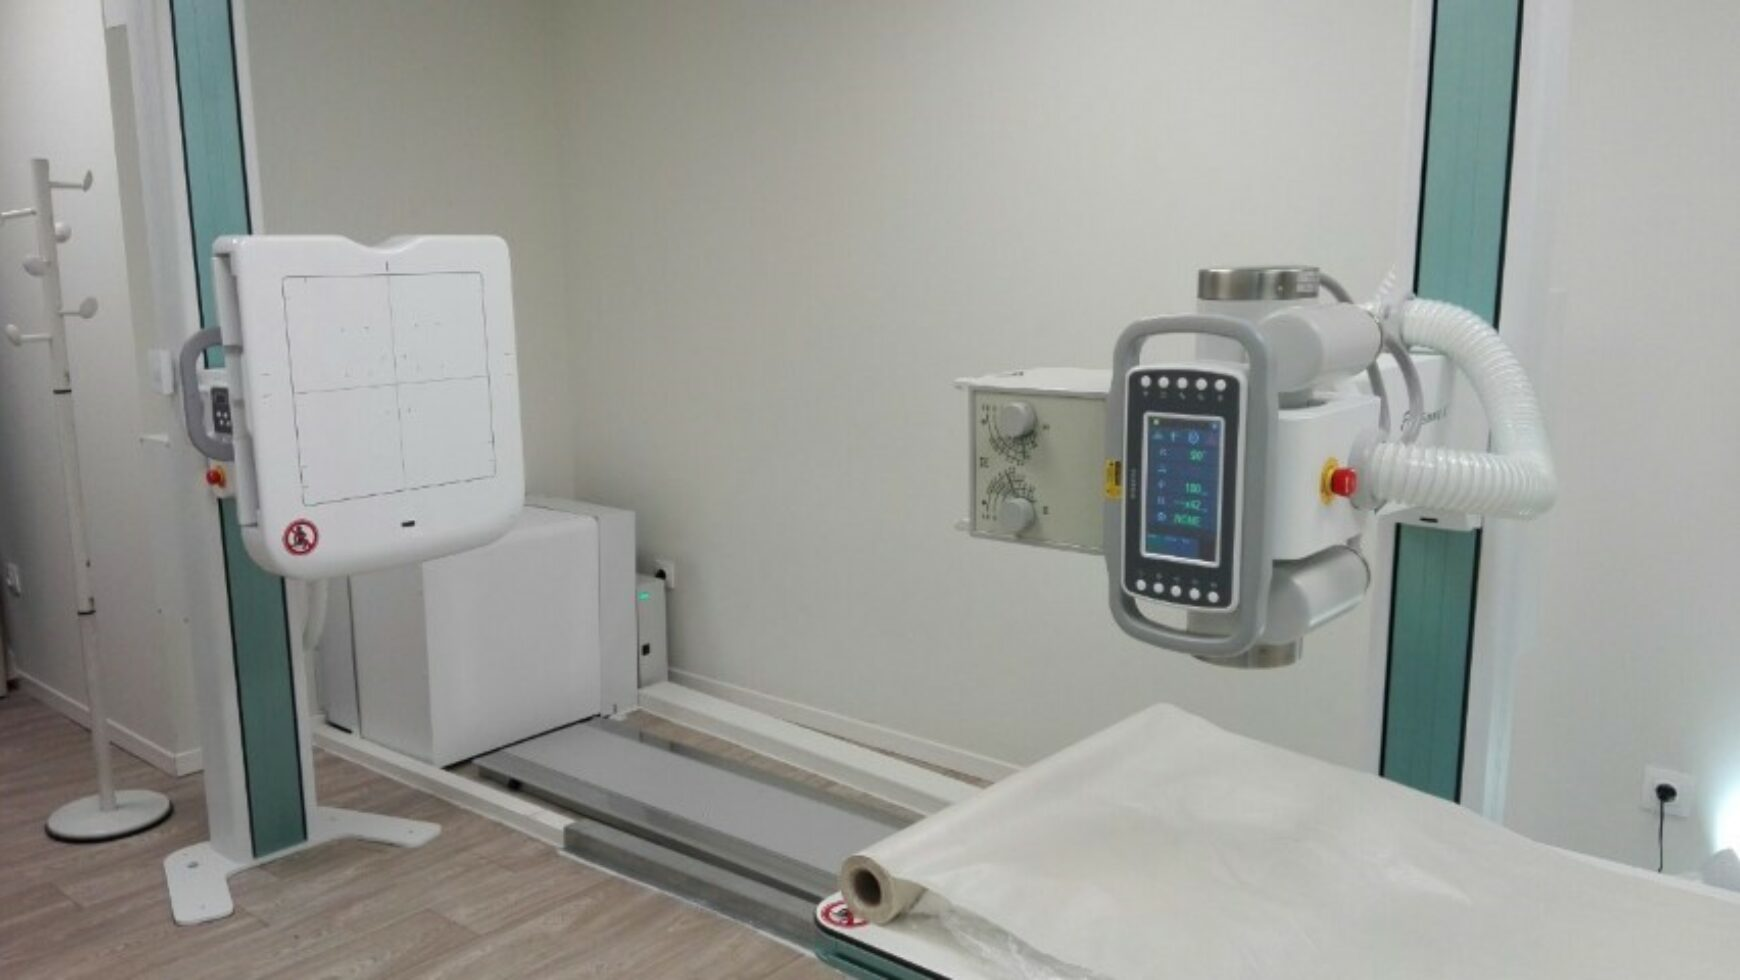 Eύρυθμη λειτουργία ακτινολογικών εργαστηρίων 1ης και 2ης ΥΠε